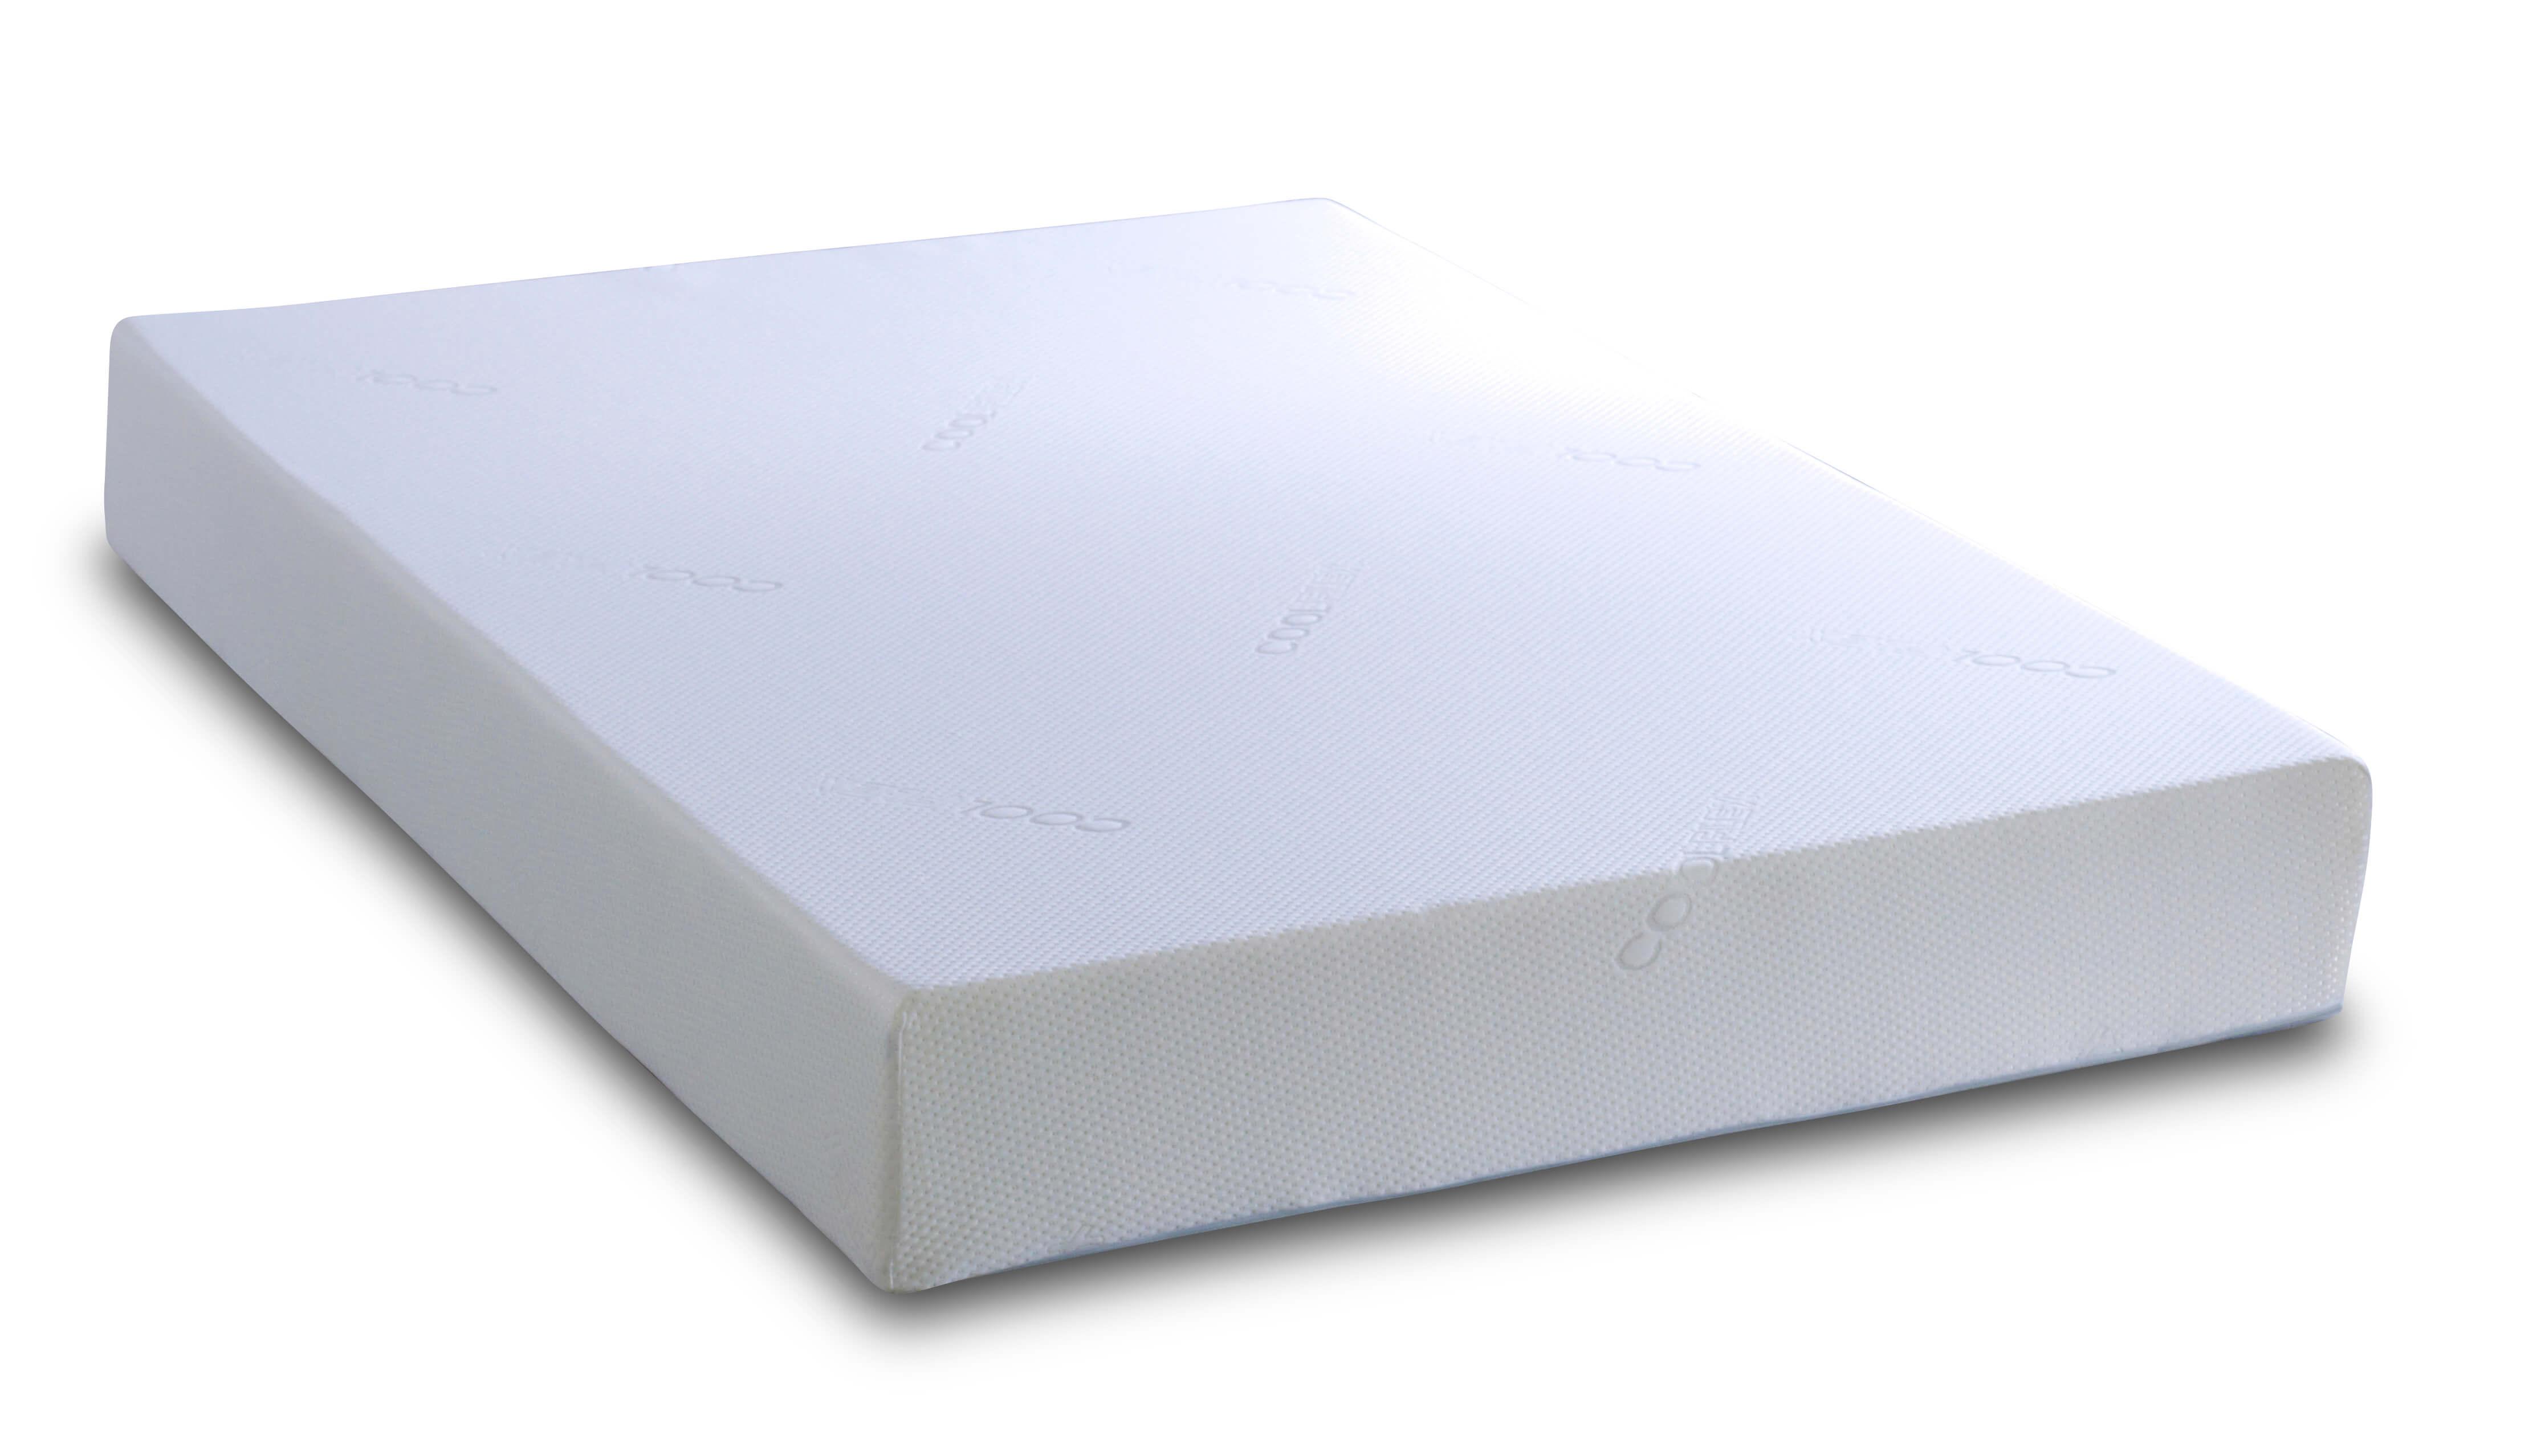 Visco Elastic Gel Memory 250 Firm Memory Foam 6ft Super King Size Mattress Ebay